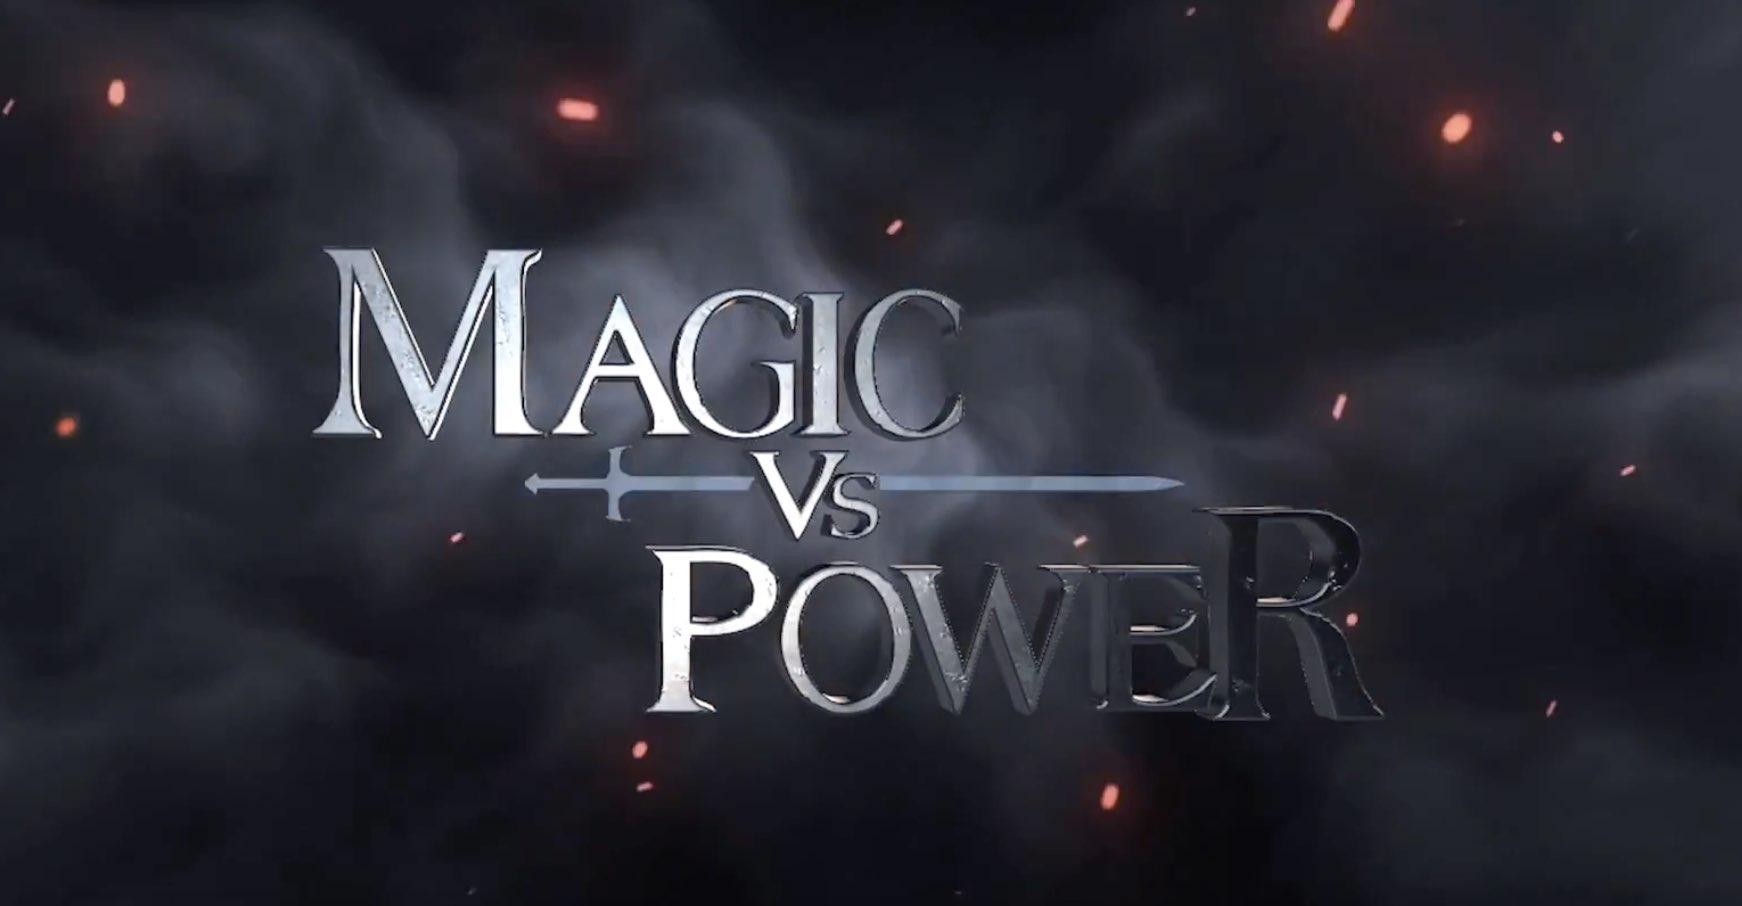 Magic vs Power hack